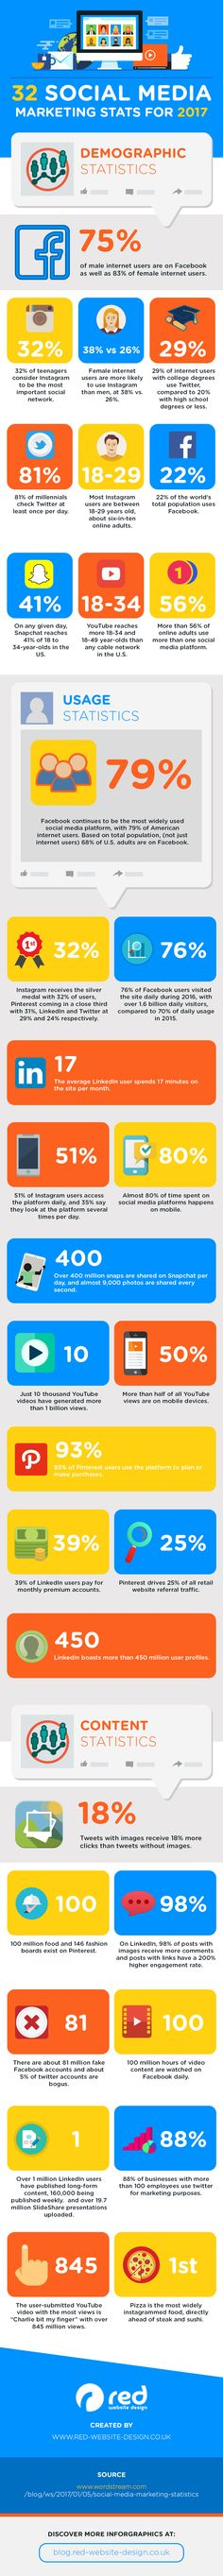 30+ Social Media Marketing Stats for 2017 [Infographic]   Social Media Today